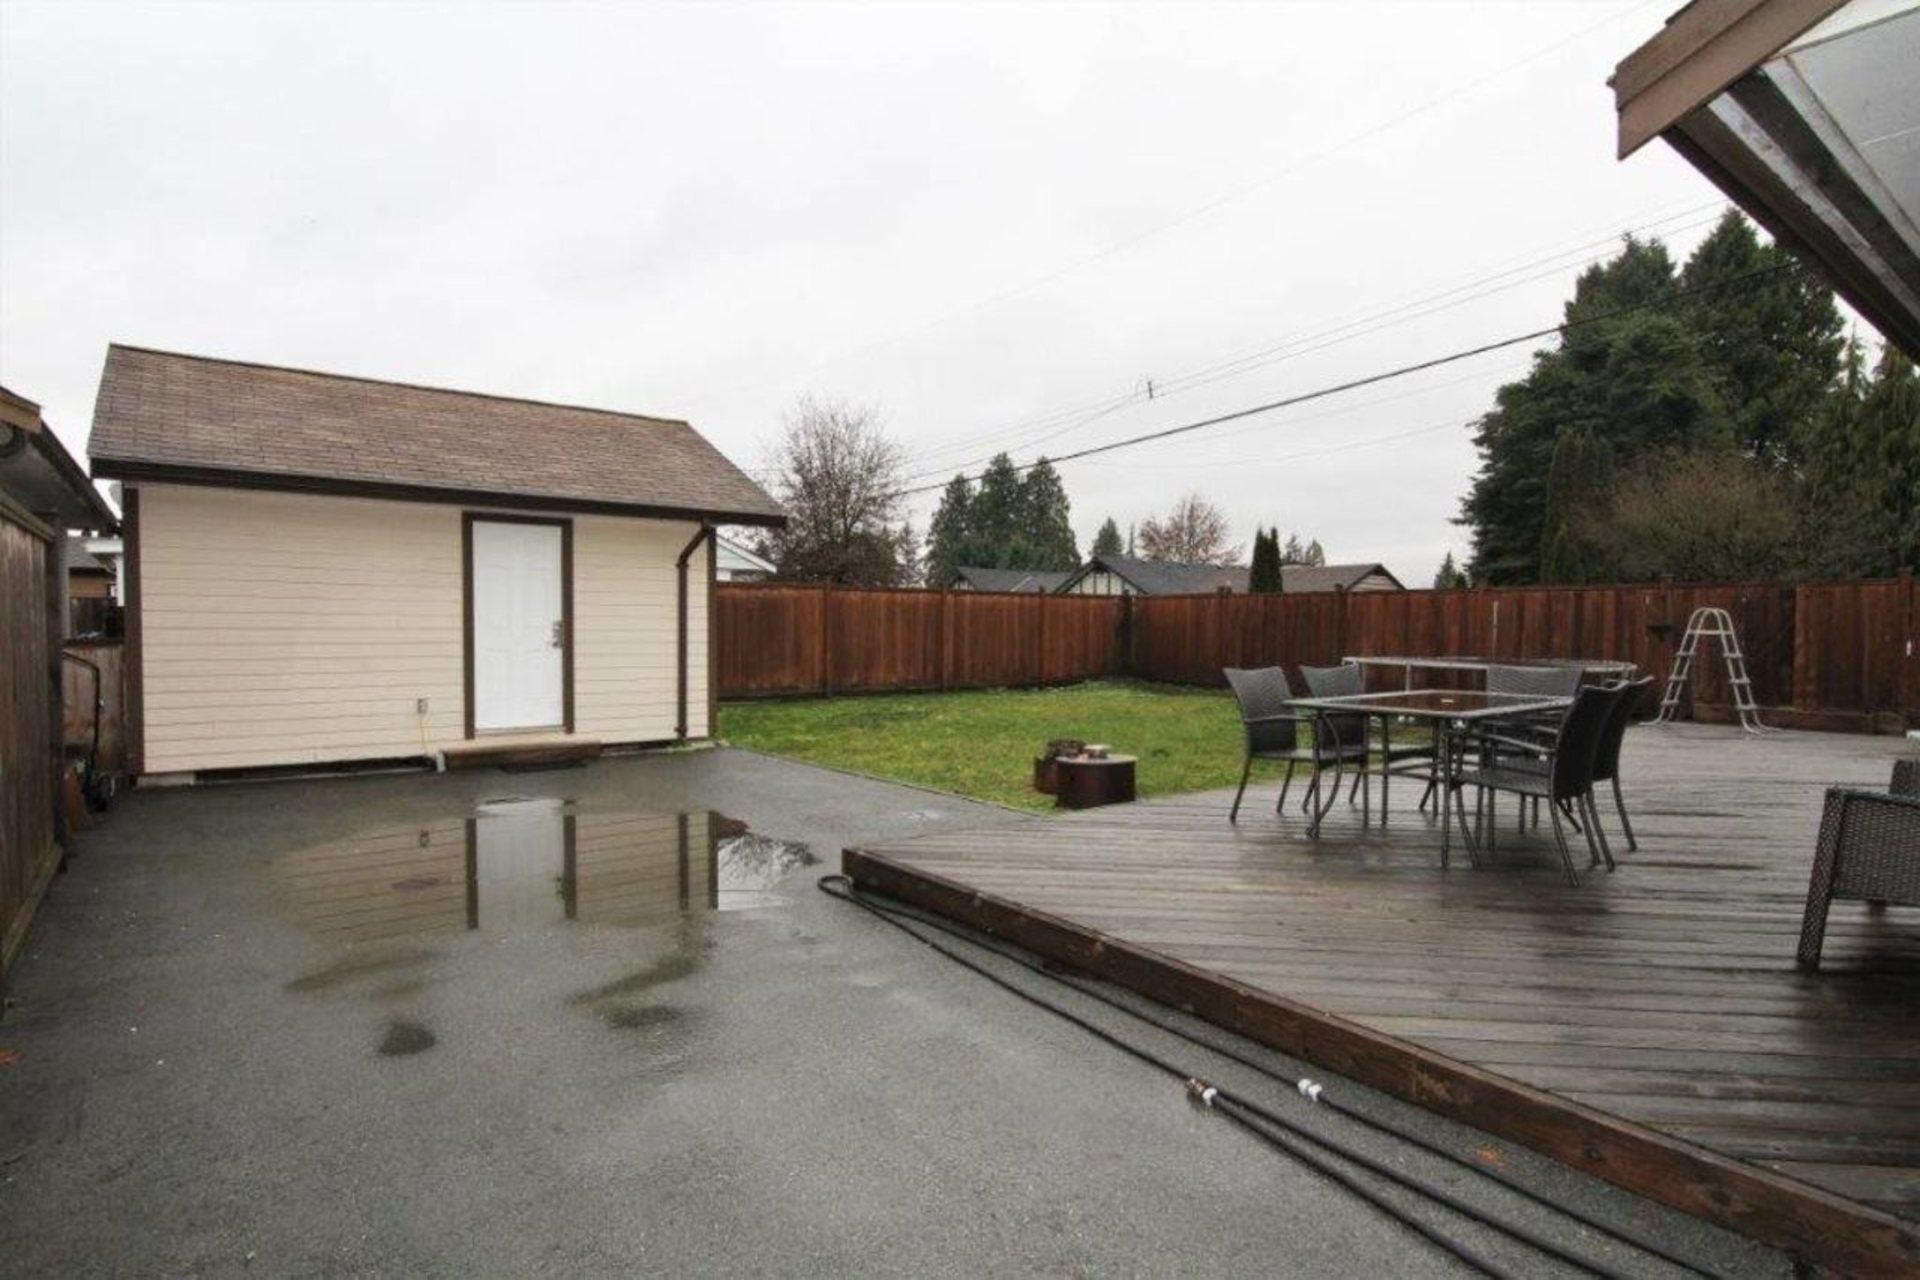 12351-203-street-west-central-maple-ridge-13 at 12351 203 Street, West Central, Maple Ridge